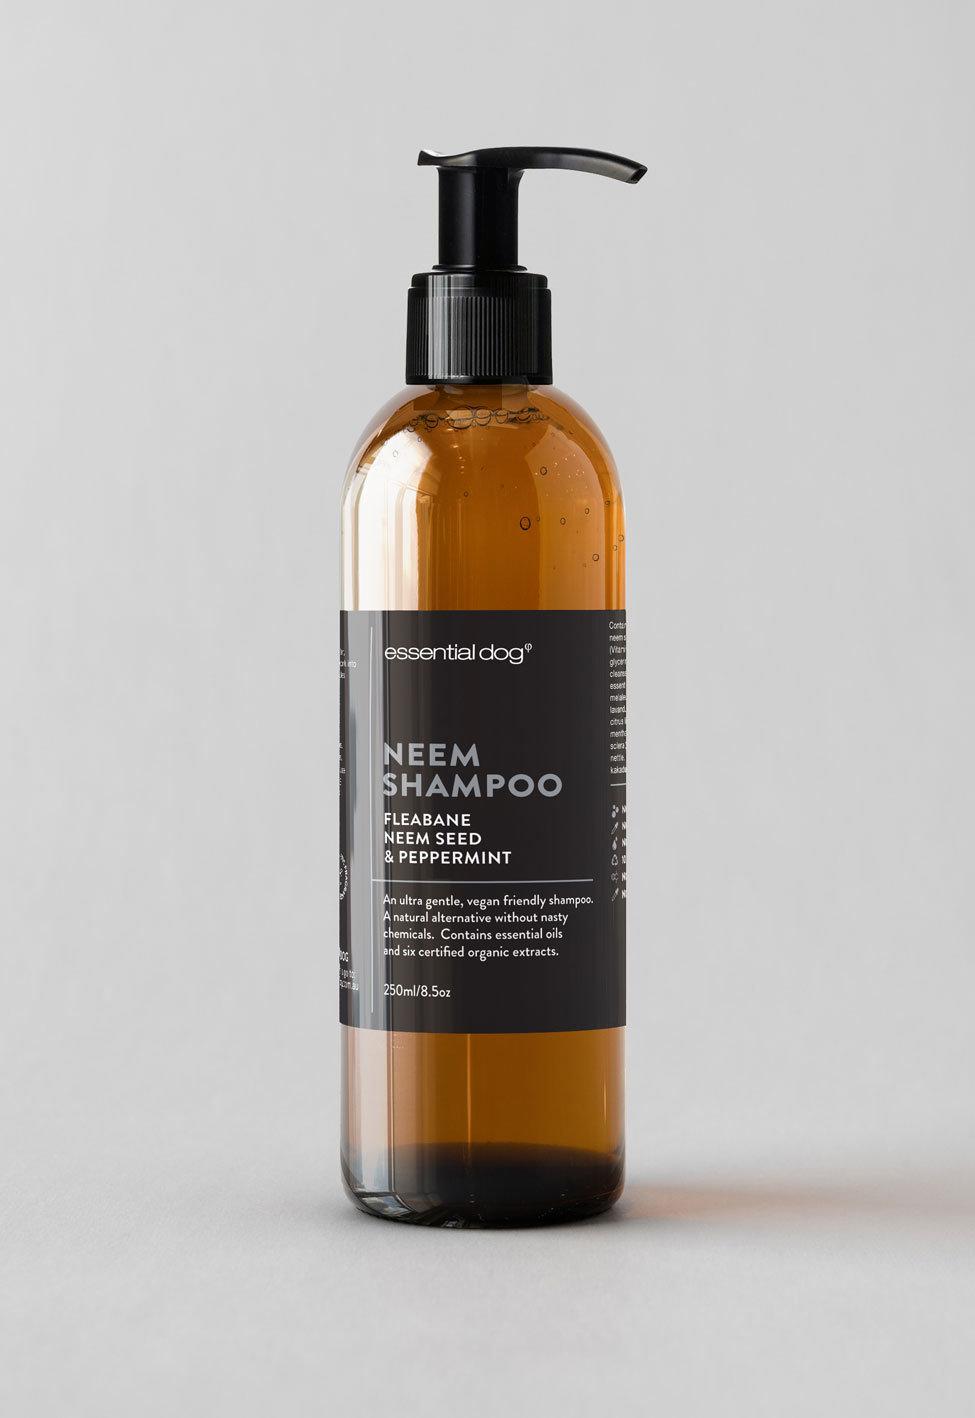 Moisturising Dog Shampoo: Neem Seed, Fleabane & Peppermint 00032